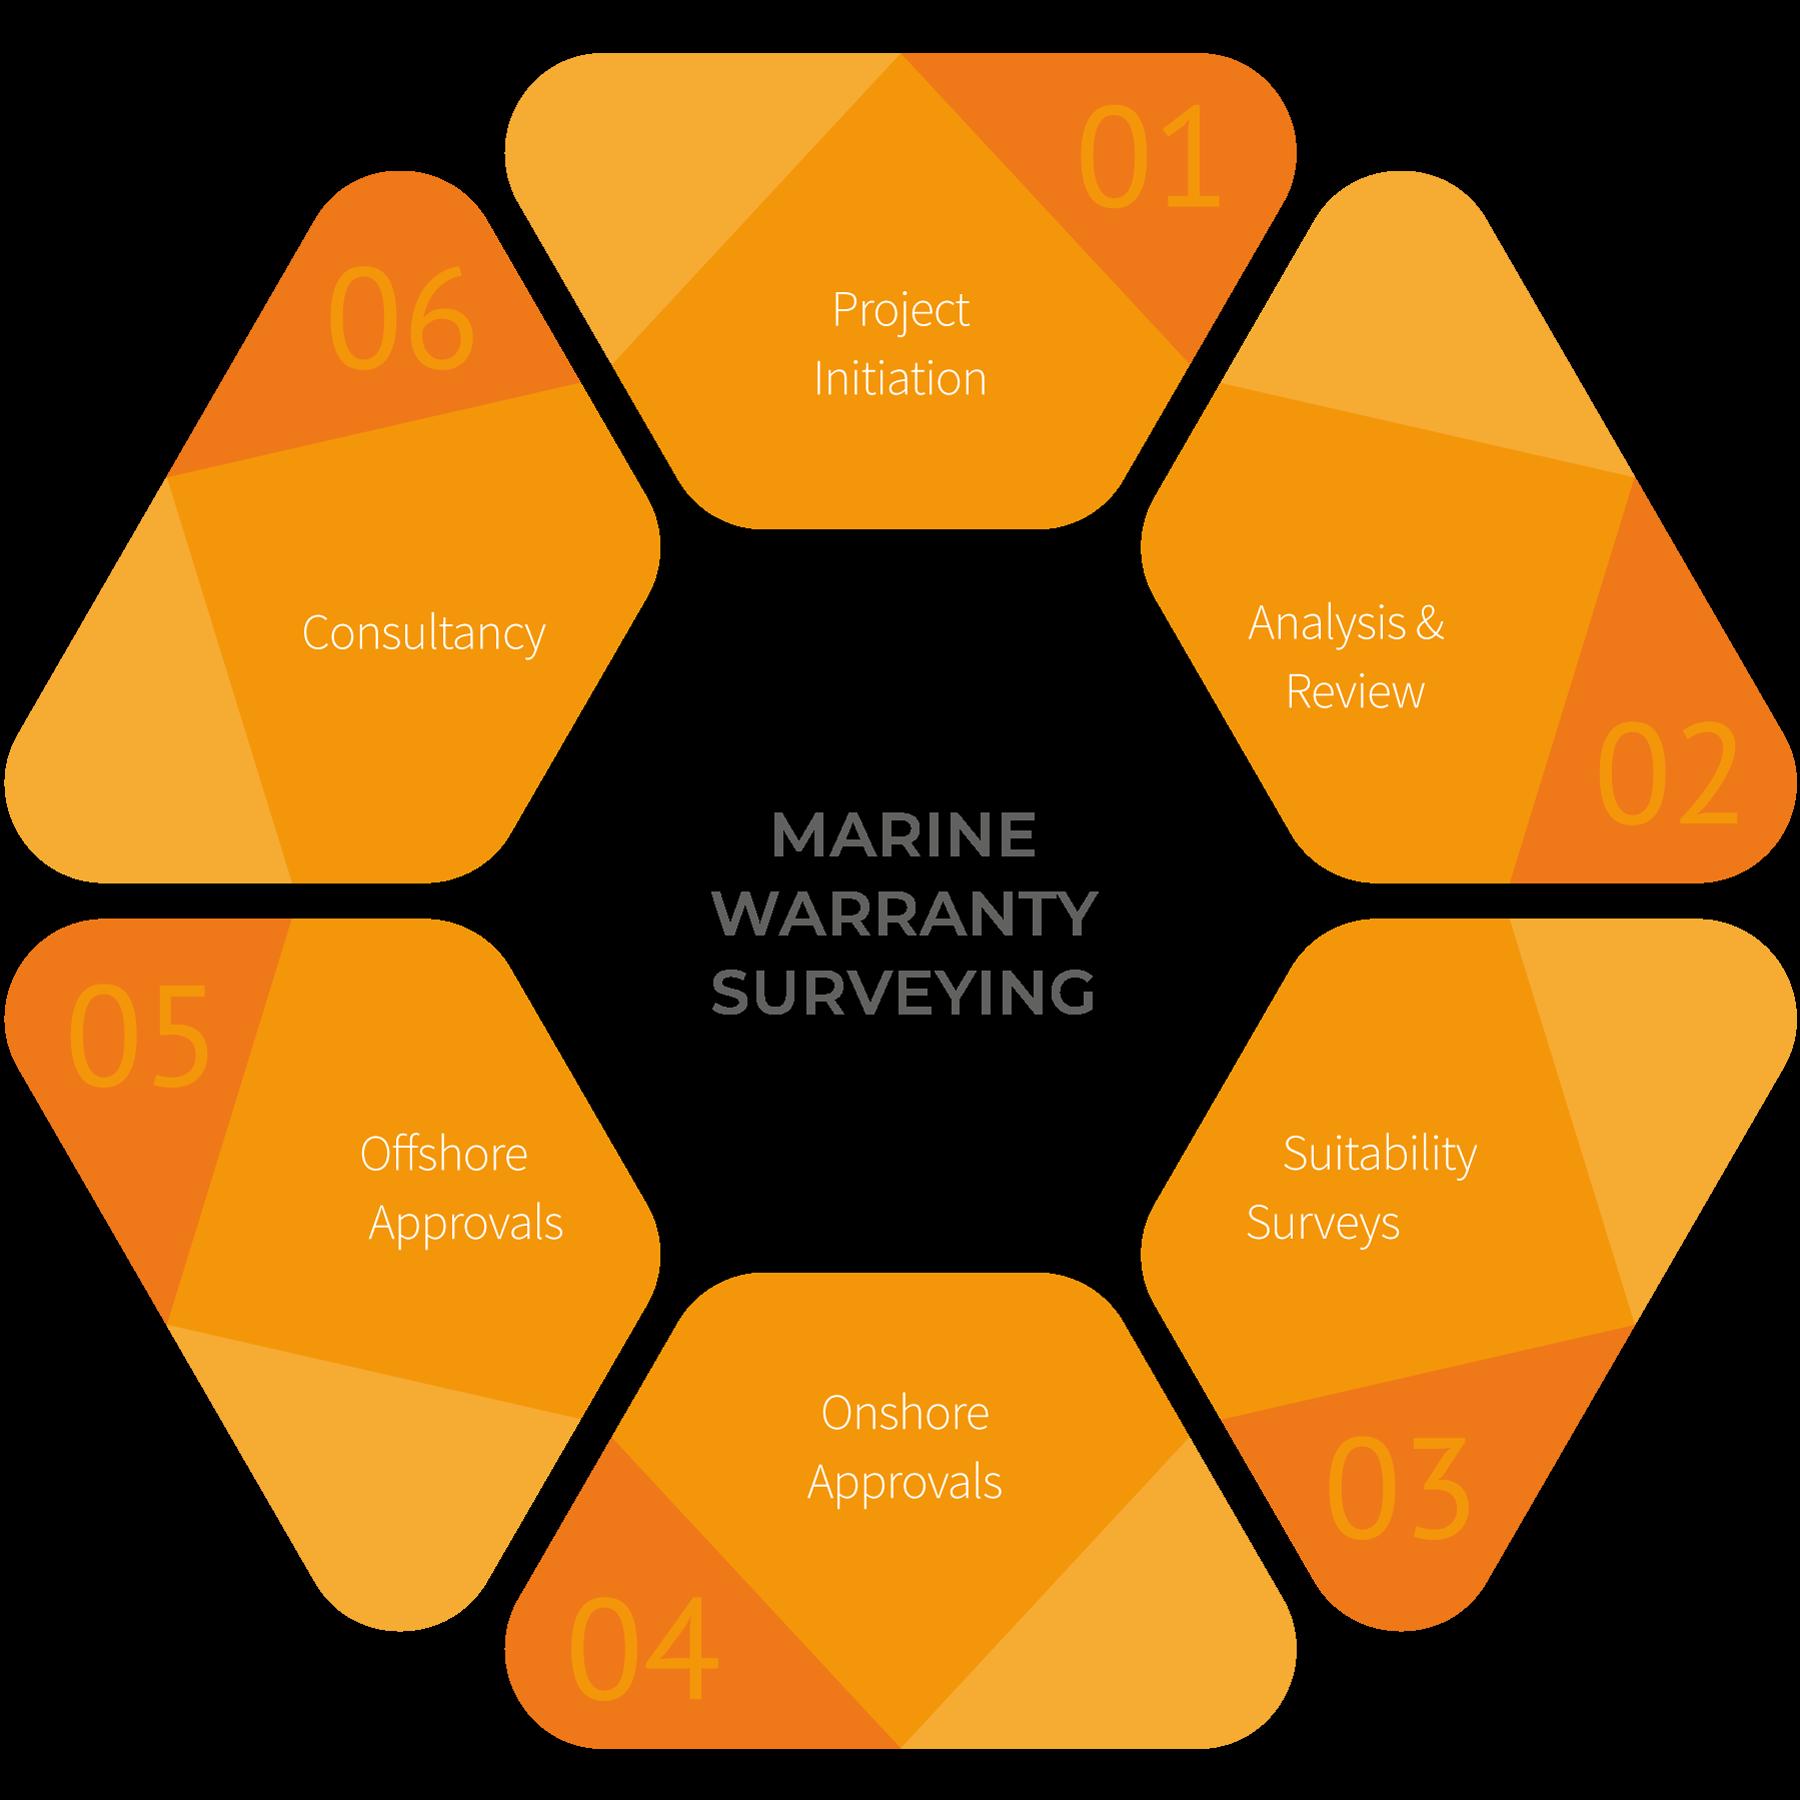 Marine Warranty Surveying